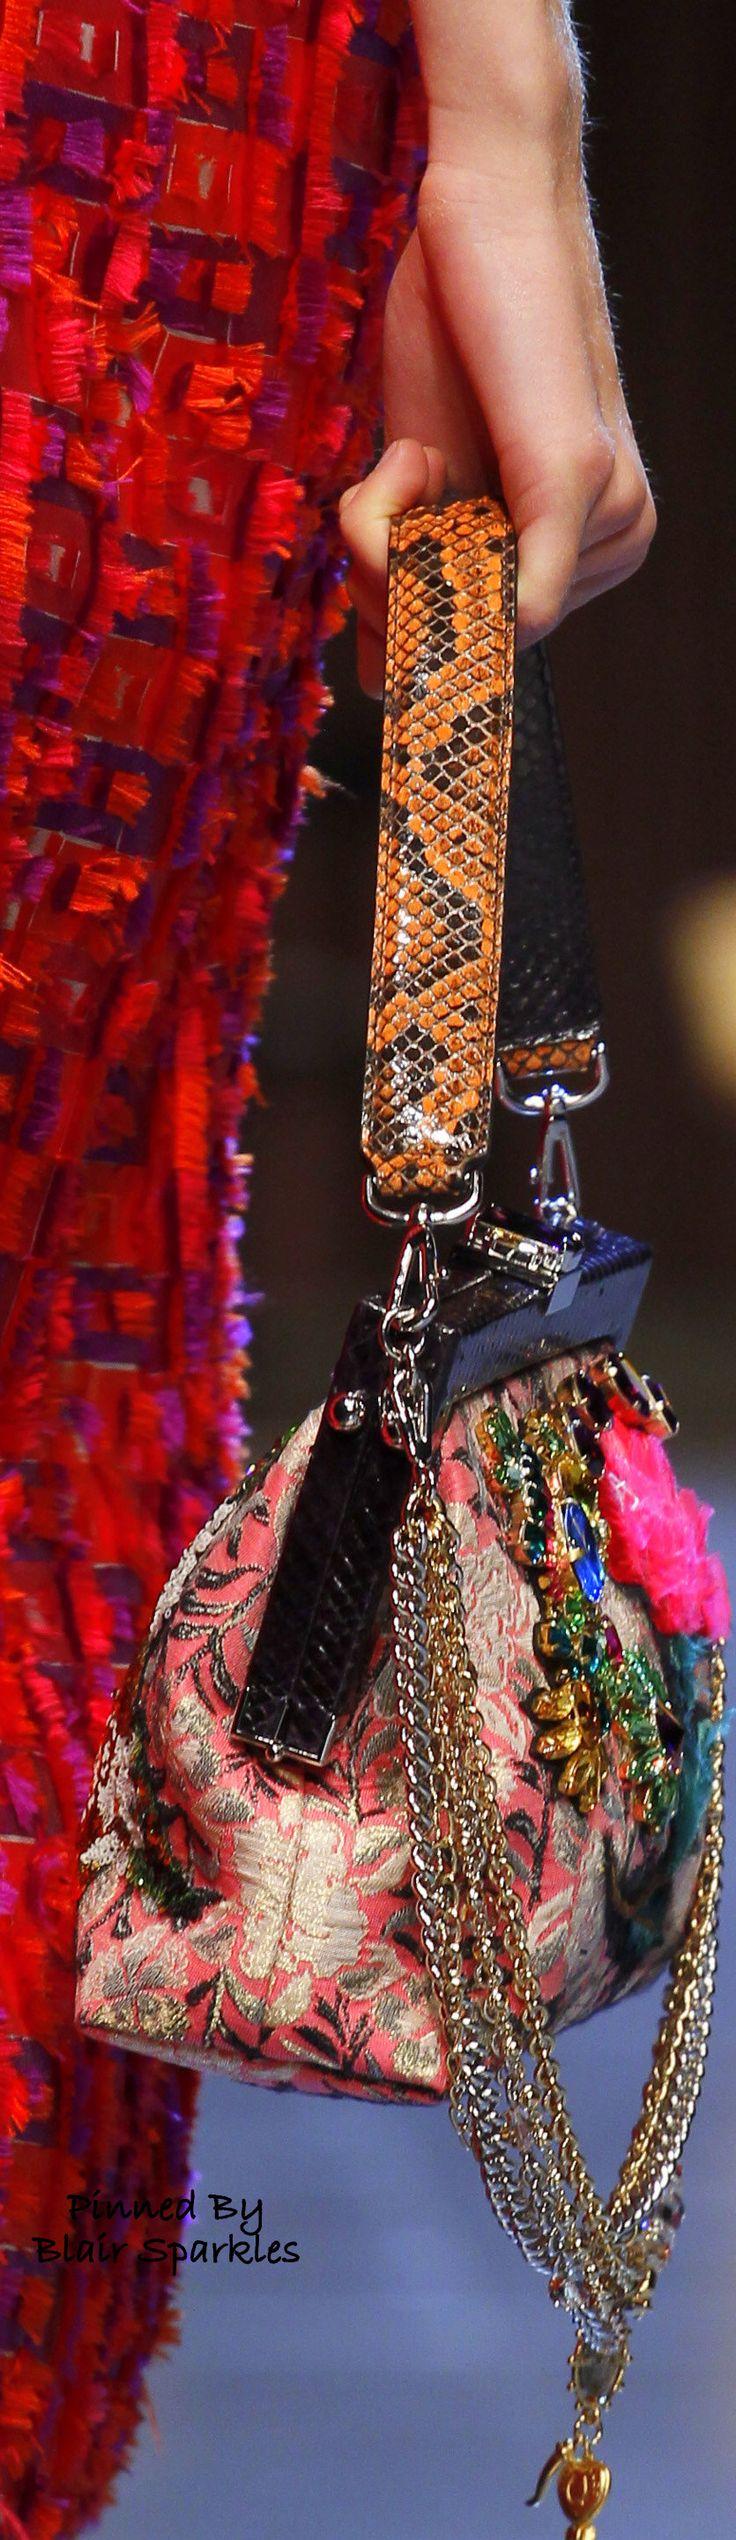 SPRING RTW 2016 (MFW) Dolce & Gabbana { Details } ~ ♕♚εїз   BLAIR SPARKLES  